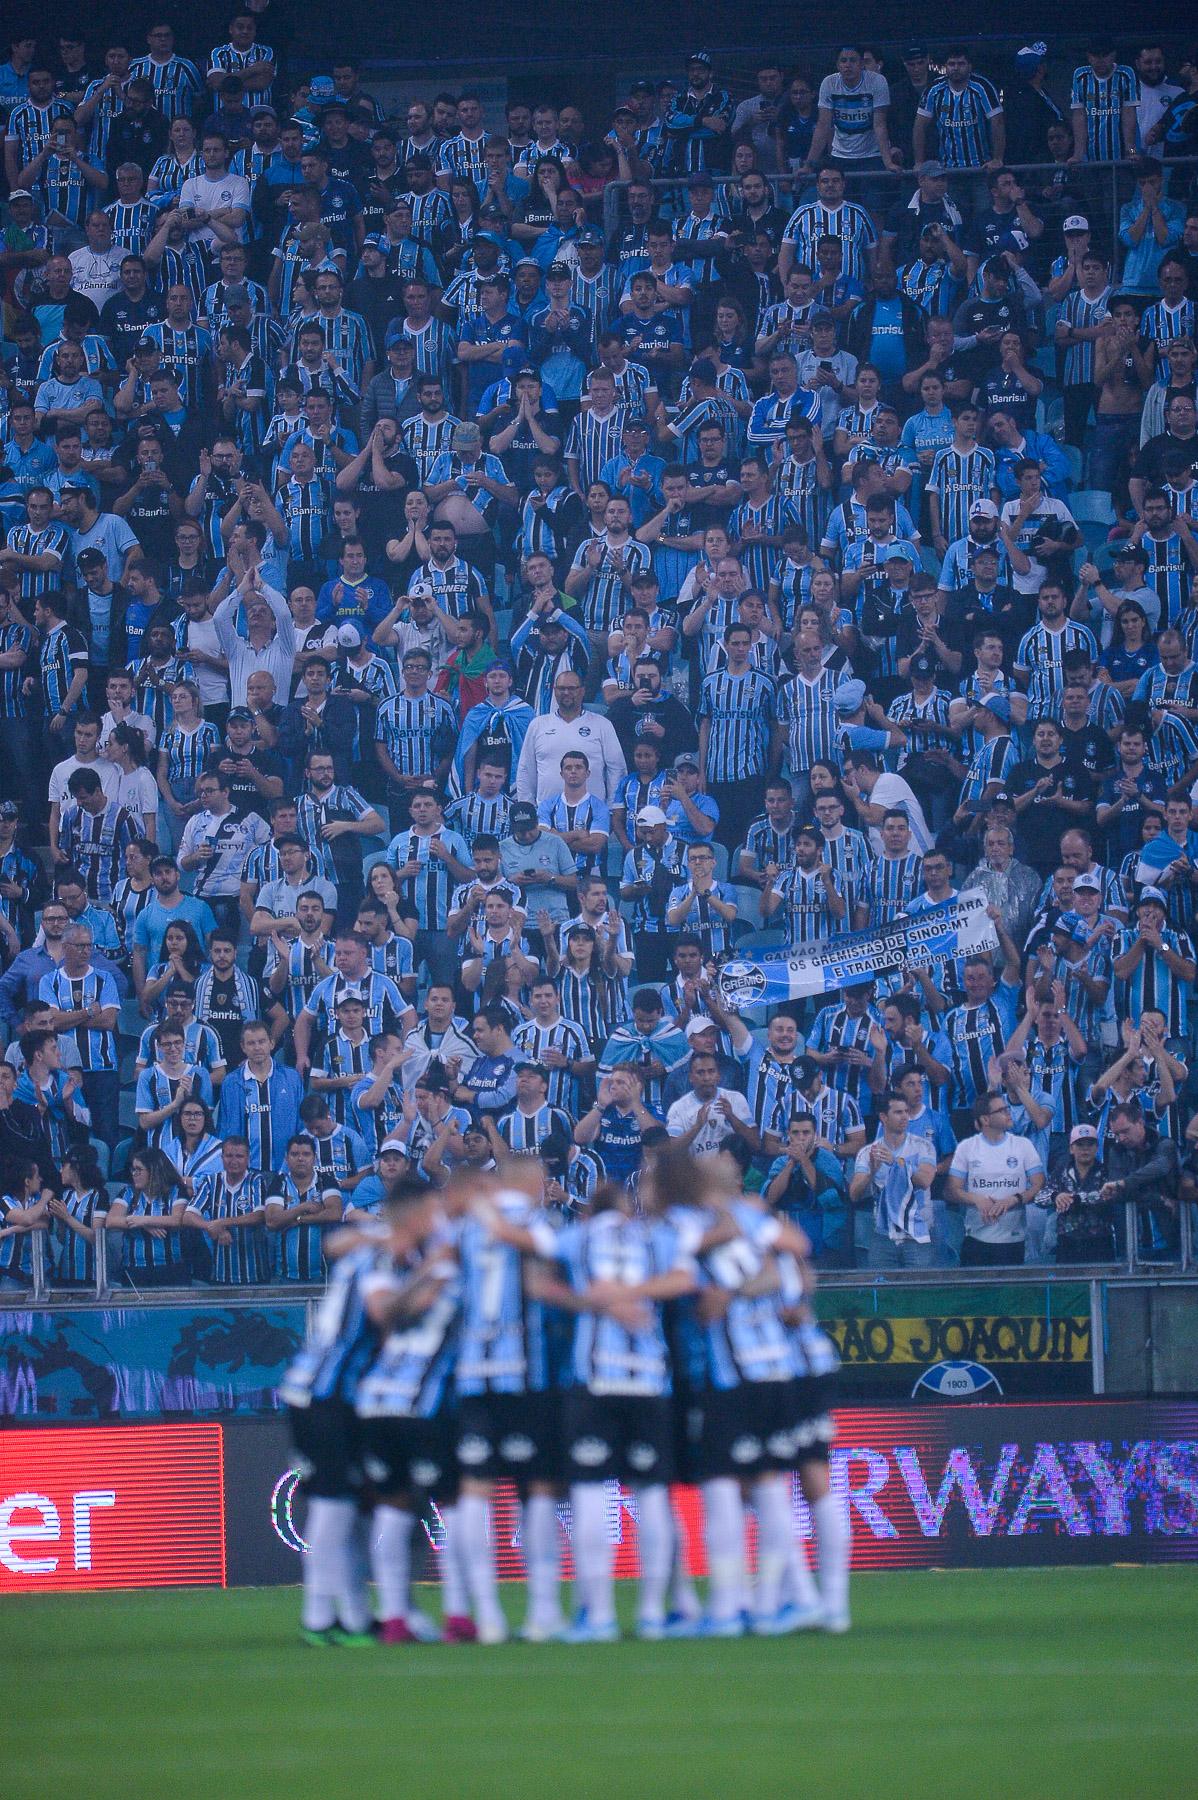 Gremio_X_Flamengo_dudabairros_Eleven_088